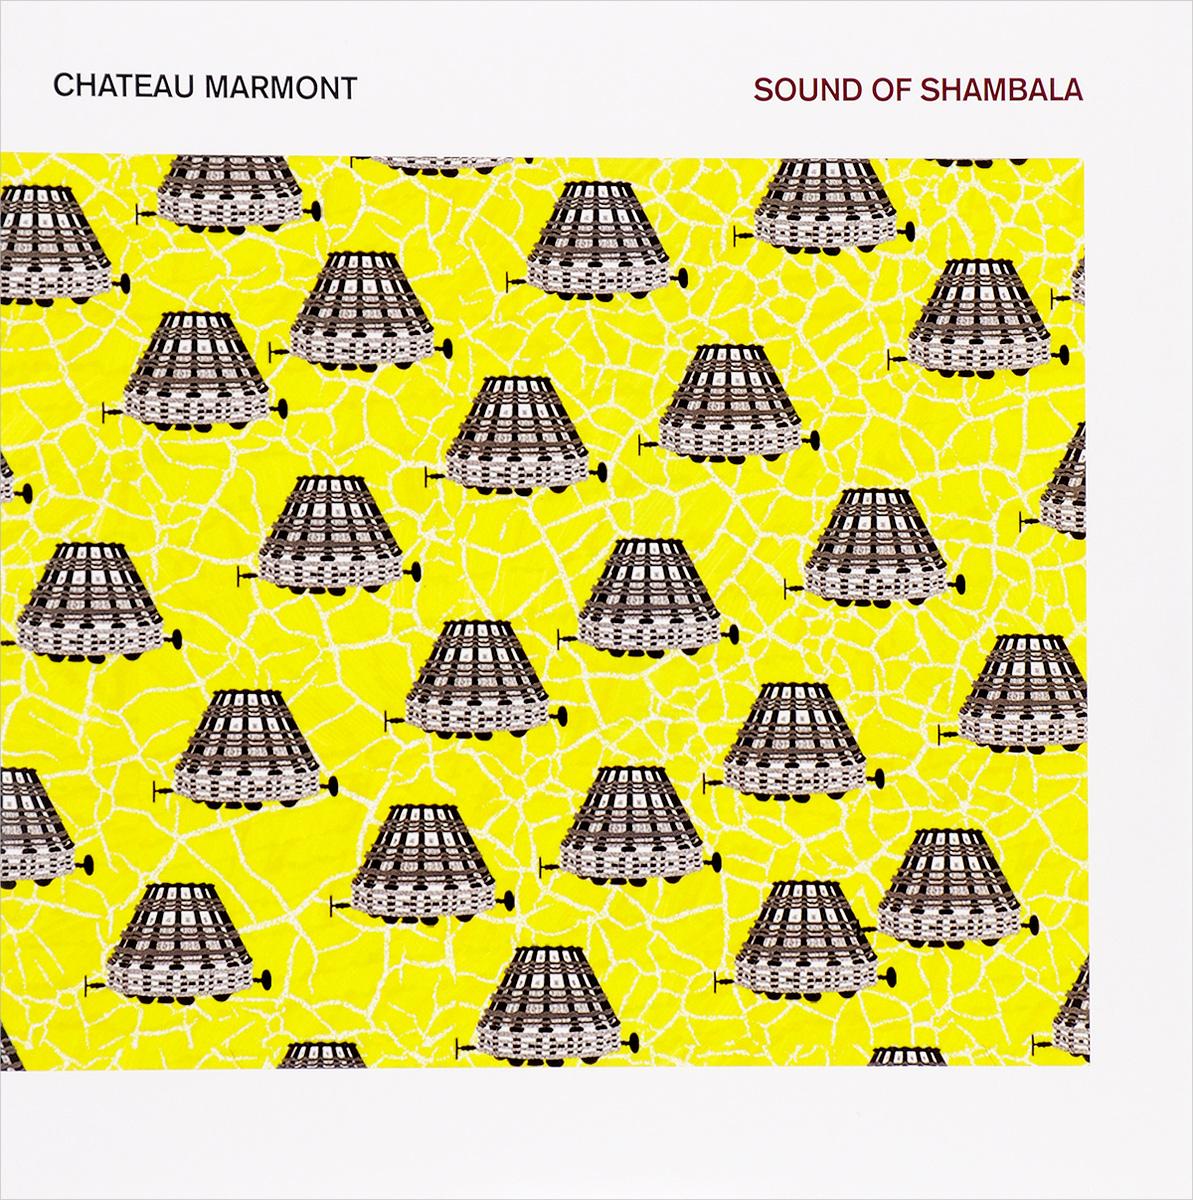 Chateau Marmont Chateau Marmont. Sound Of Shambala (2 LP) anastasia novykh sensei of shambala book ii isbn 978 966 2296 11 2